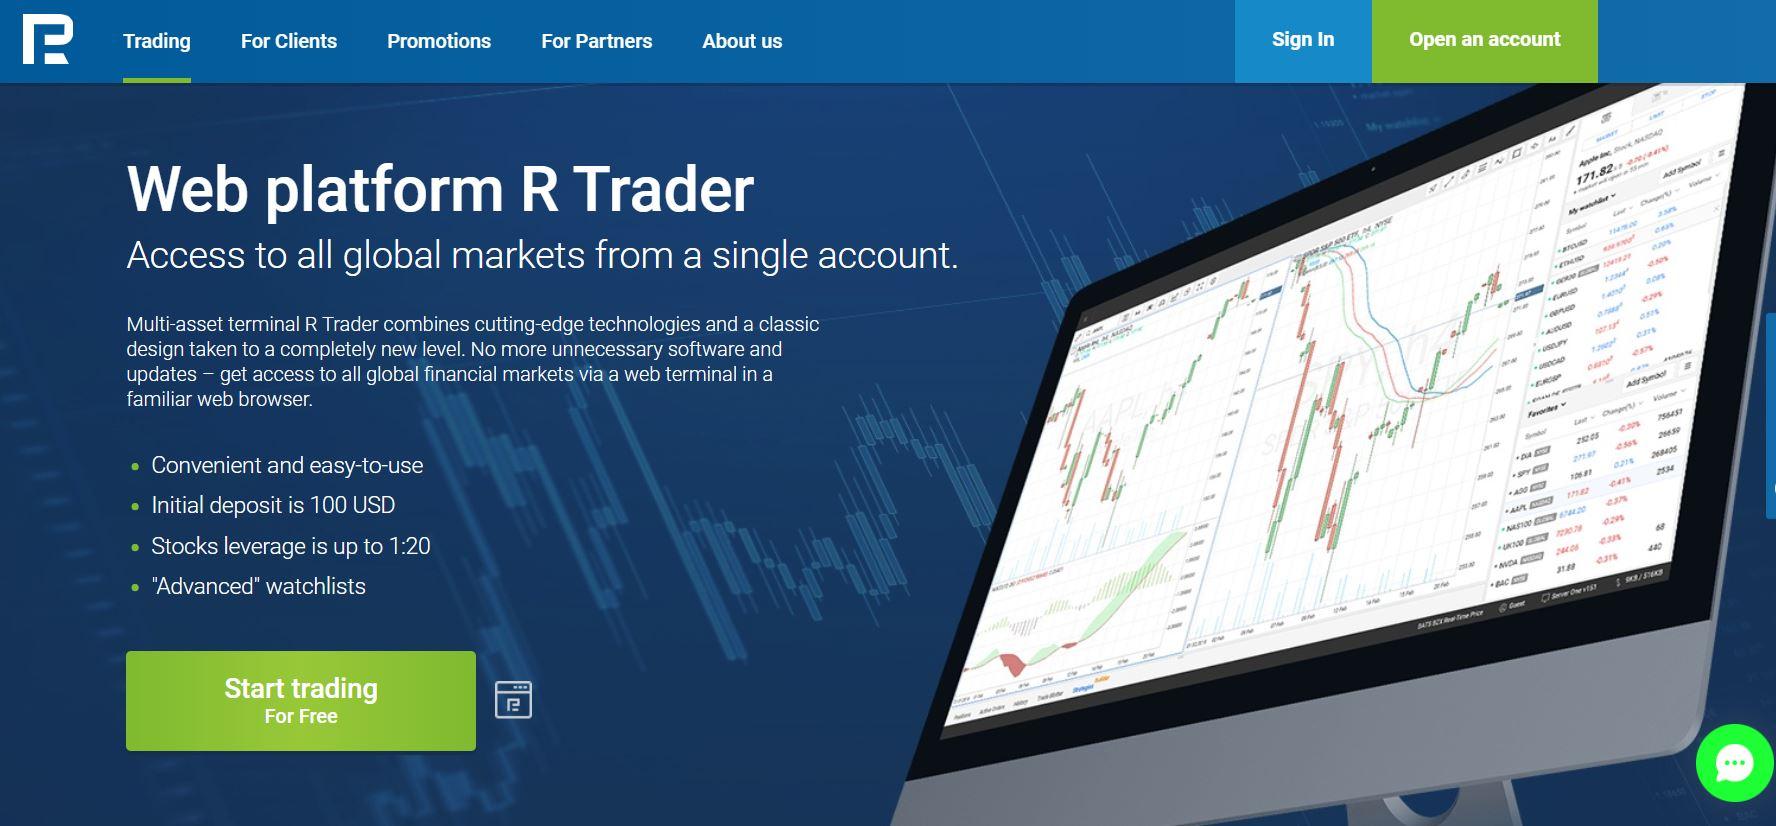 nền tảng R trader của Roboforex